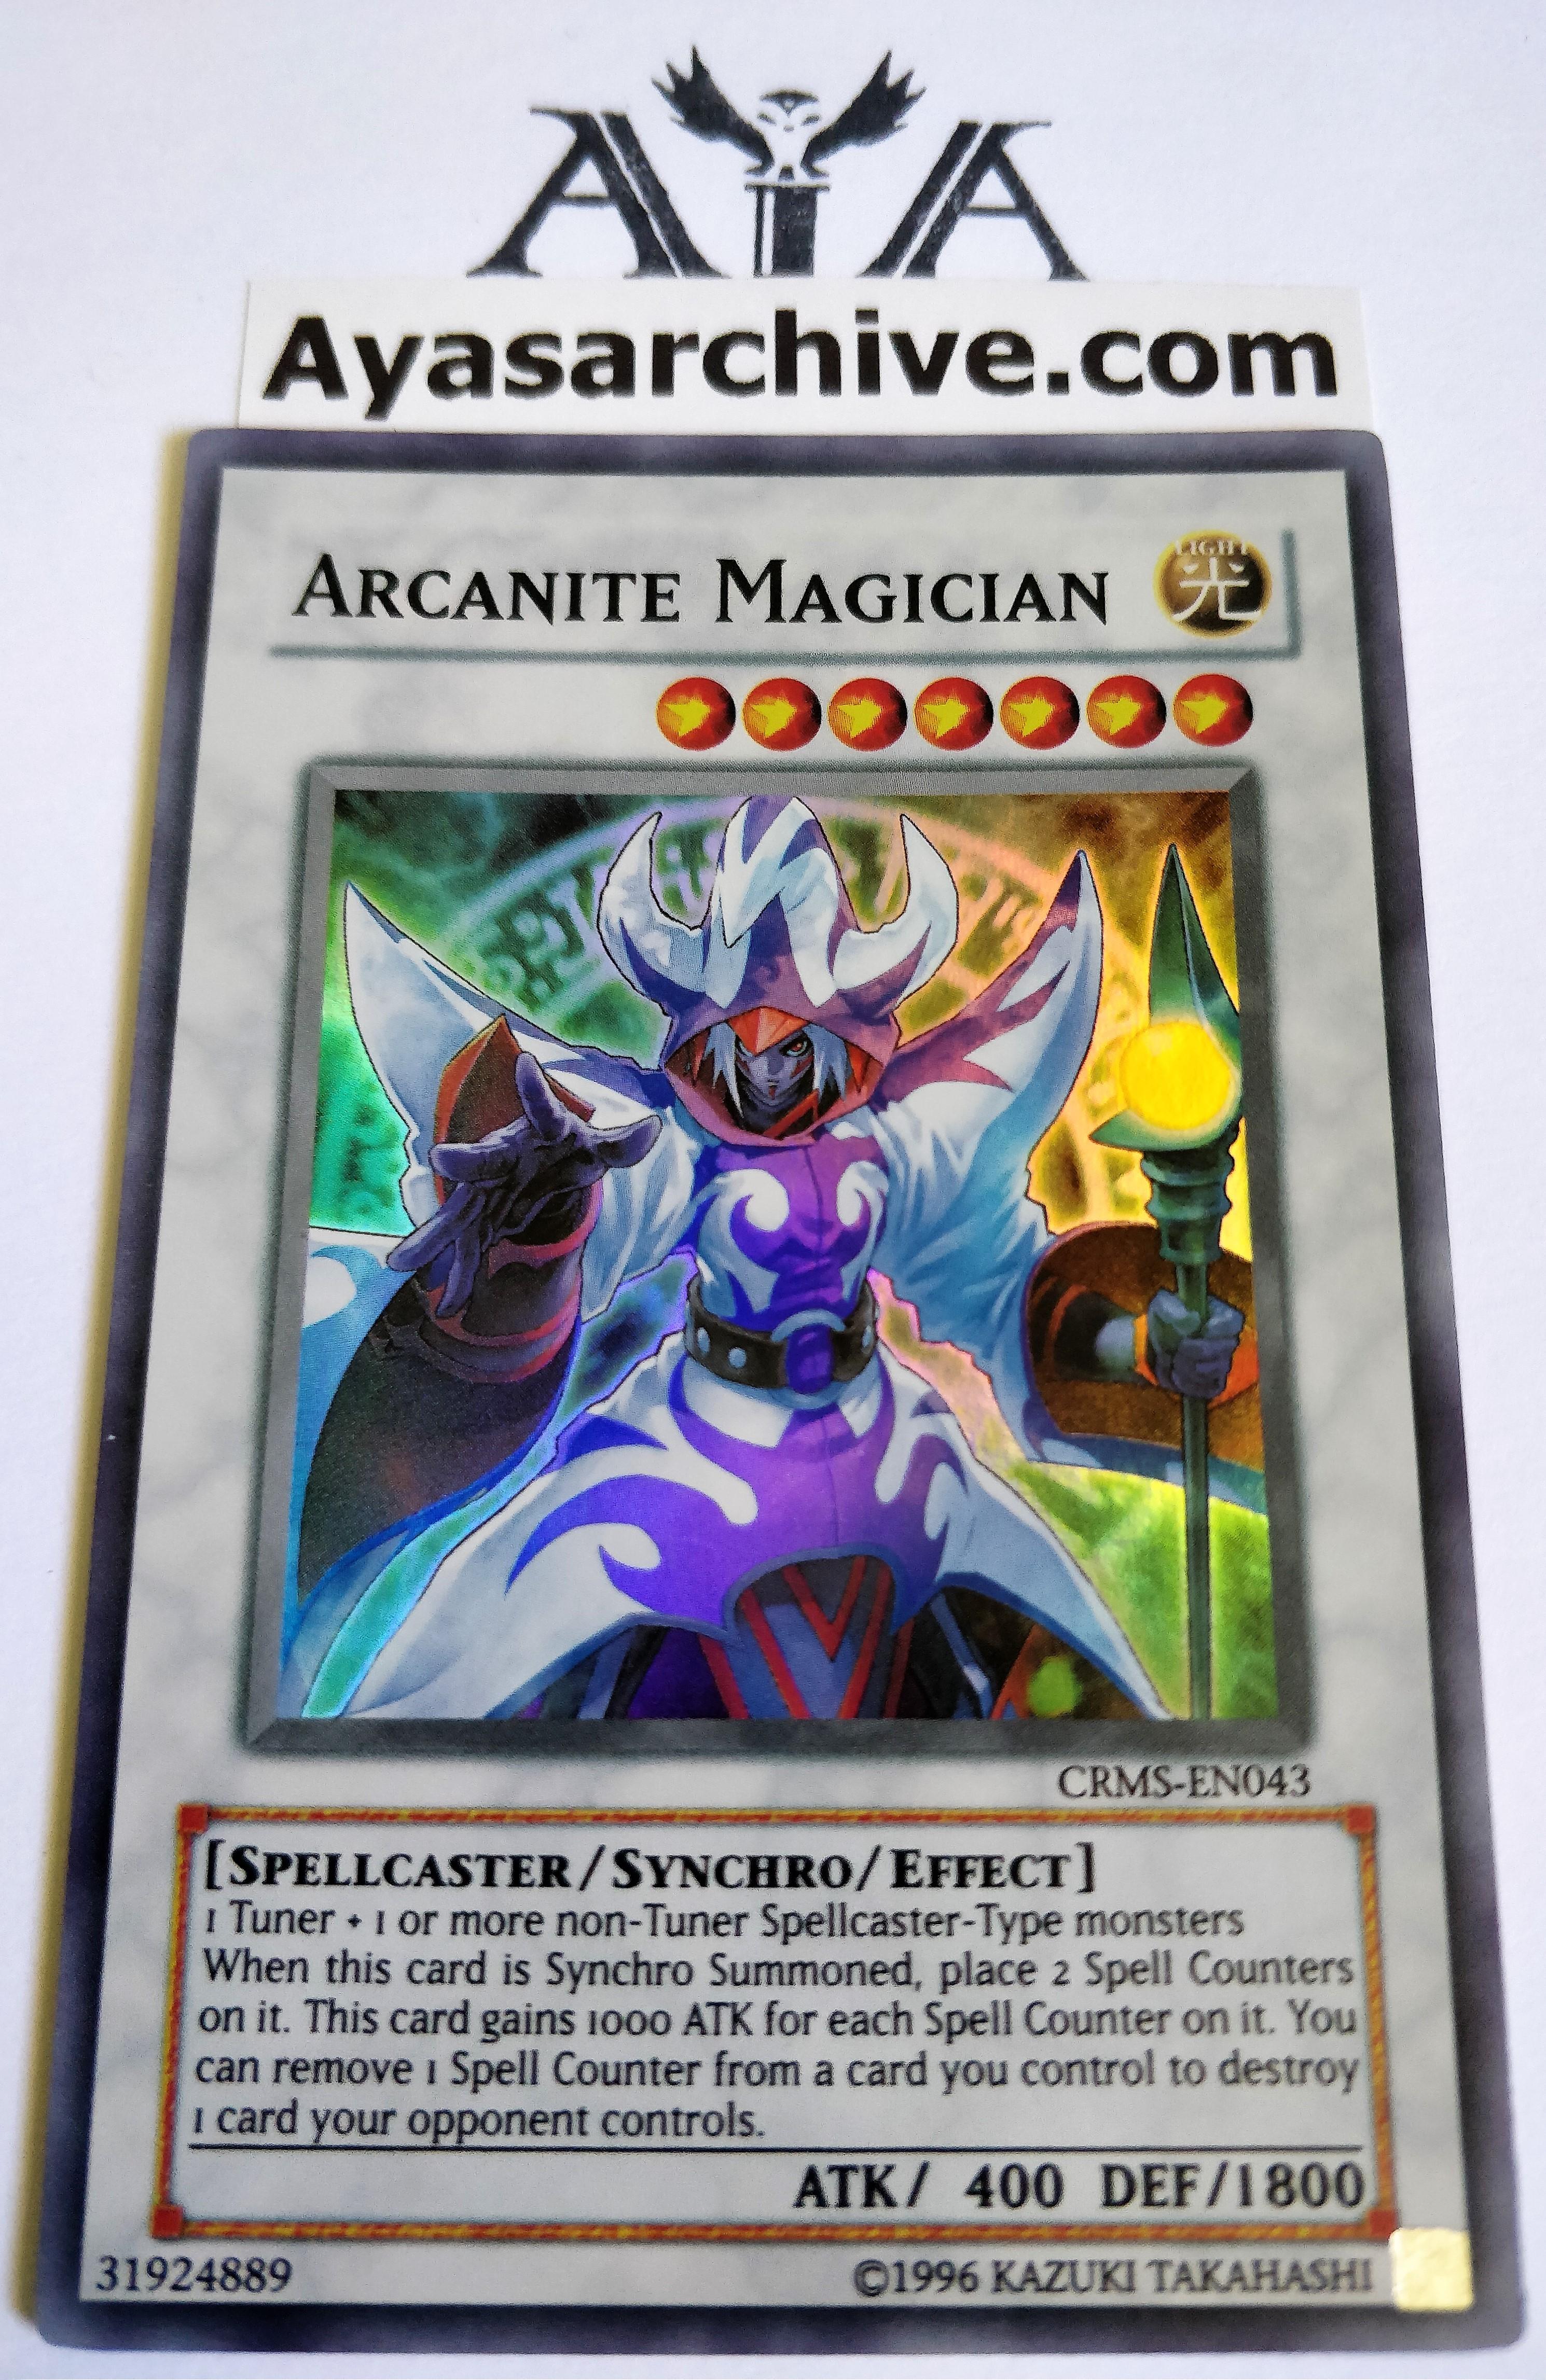 Arcanite Magician - CRMS-EN043 - Super Rare - Unlimited Edition